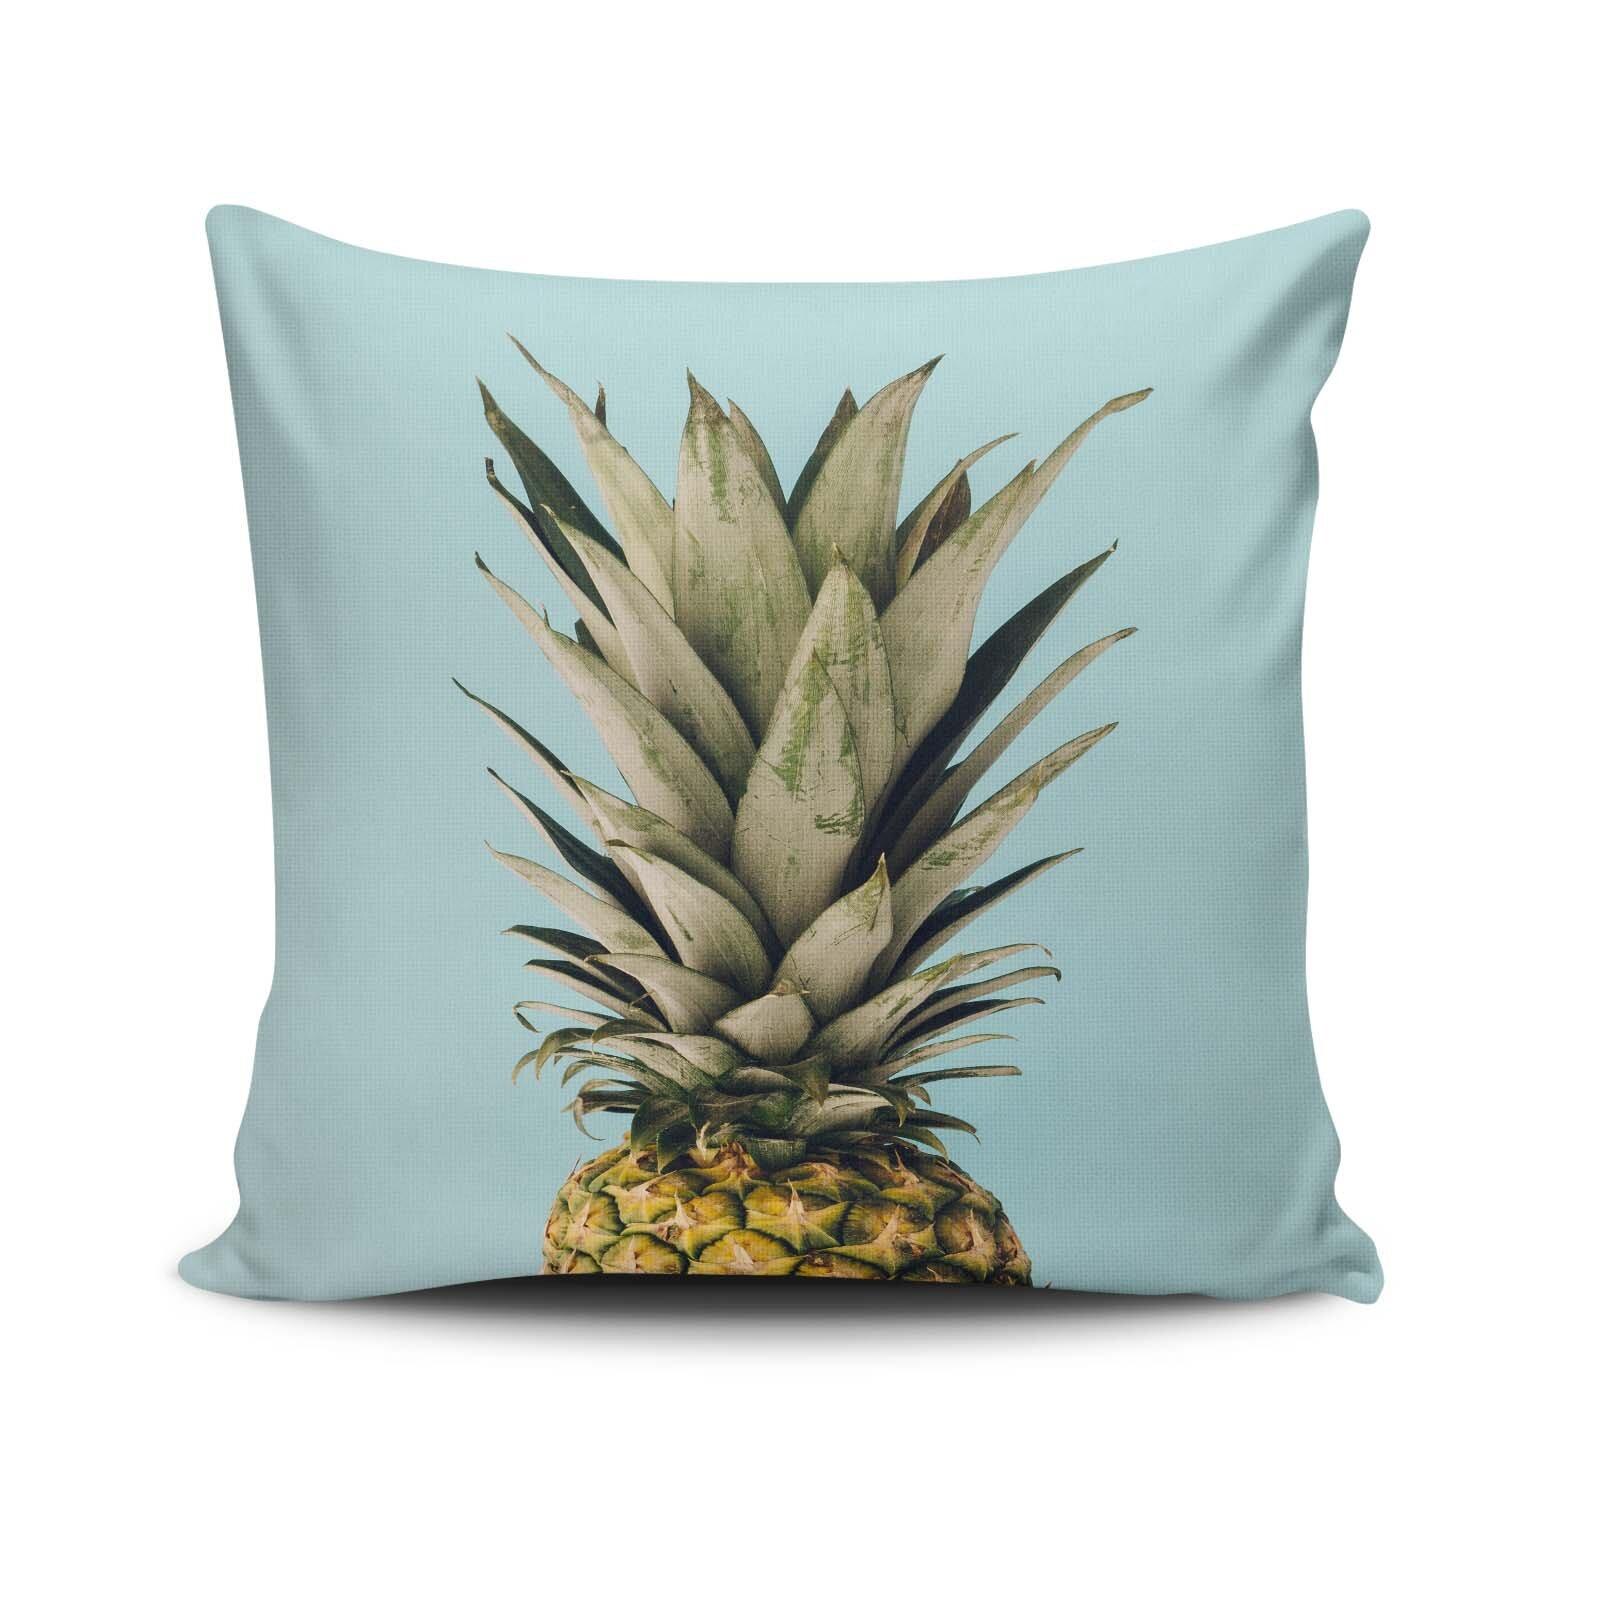 Perna decorativa Cushion Love, Dimensiune: 45 x 45 cm, Material exterior: 50% bumbac / 50% poliester 768CLV0234